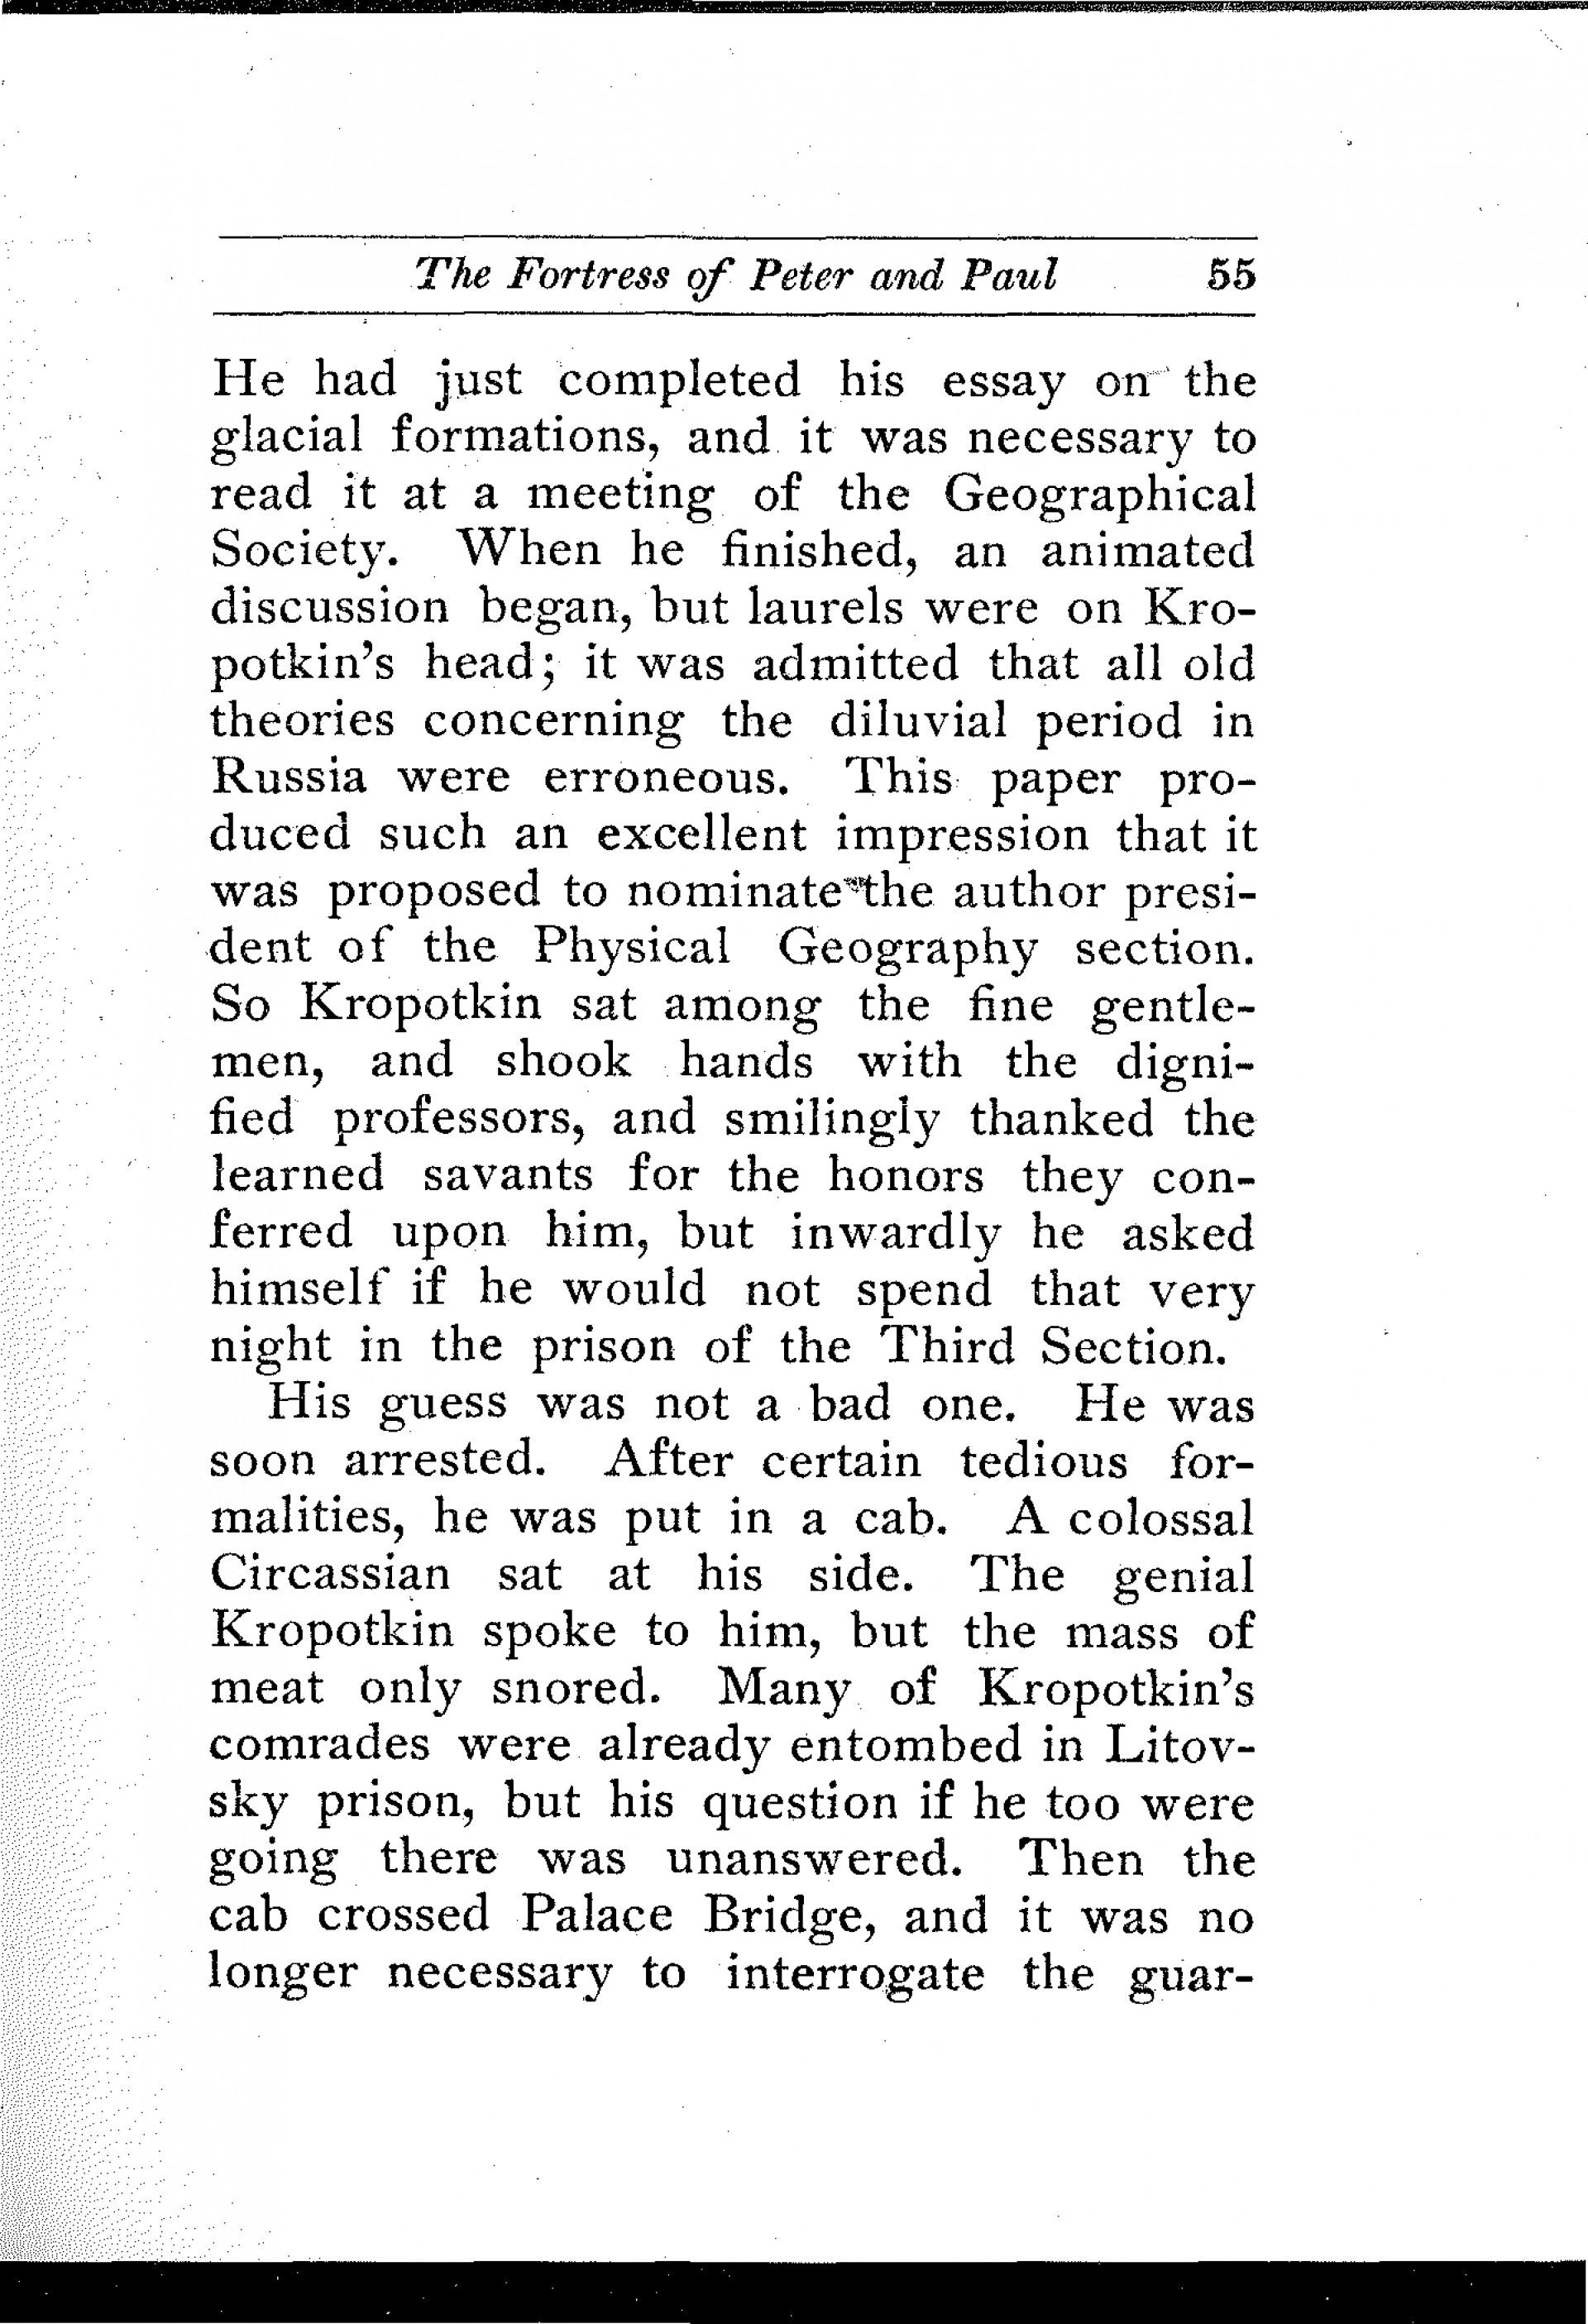 005 Essay Example Wonderful Terrorism Topics In English War On 1920